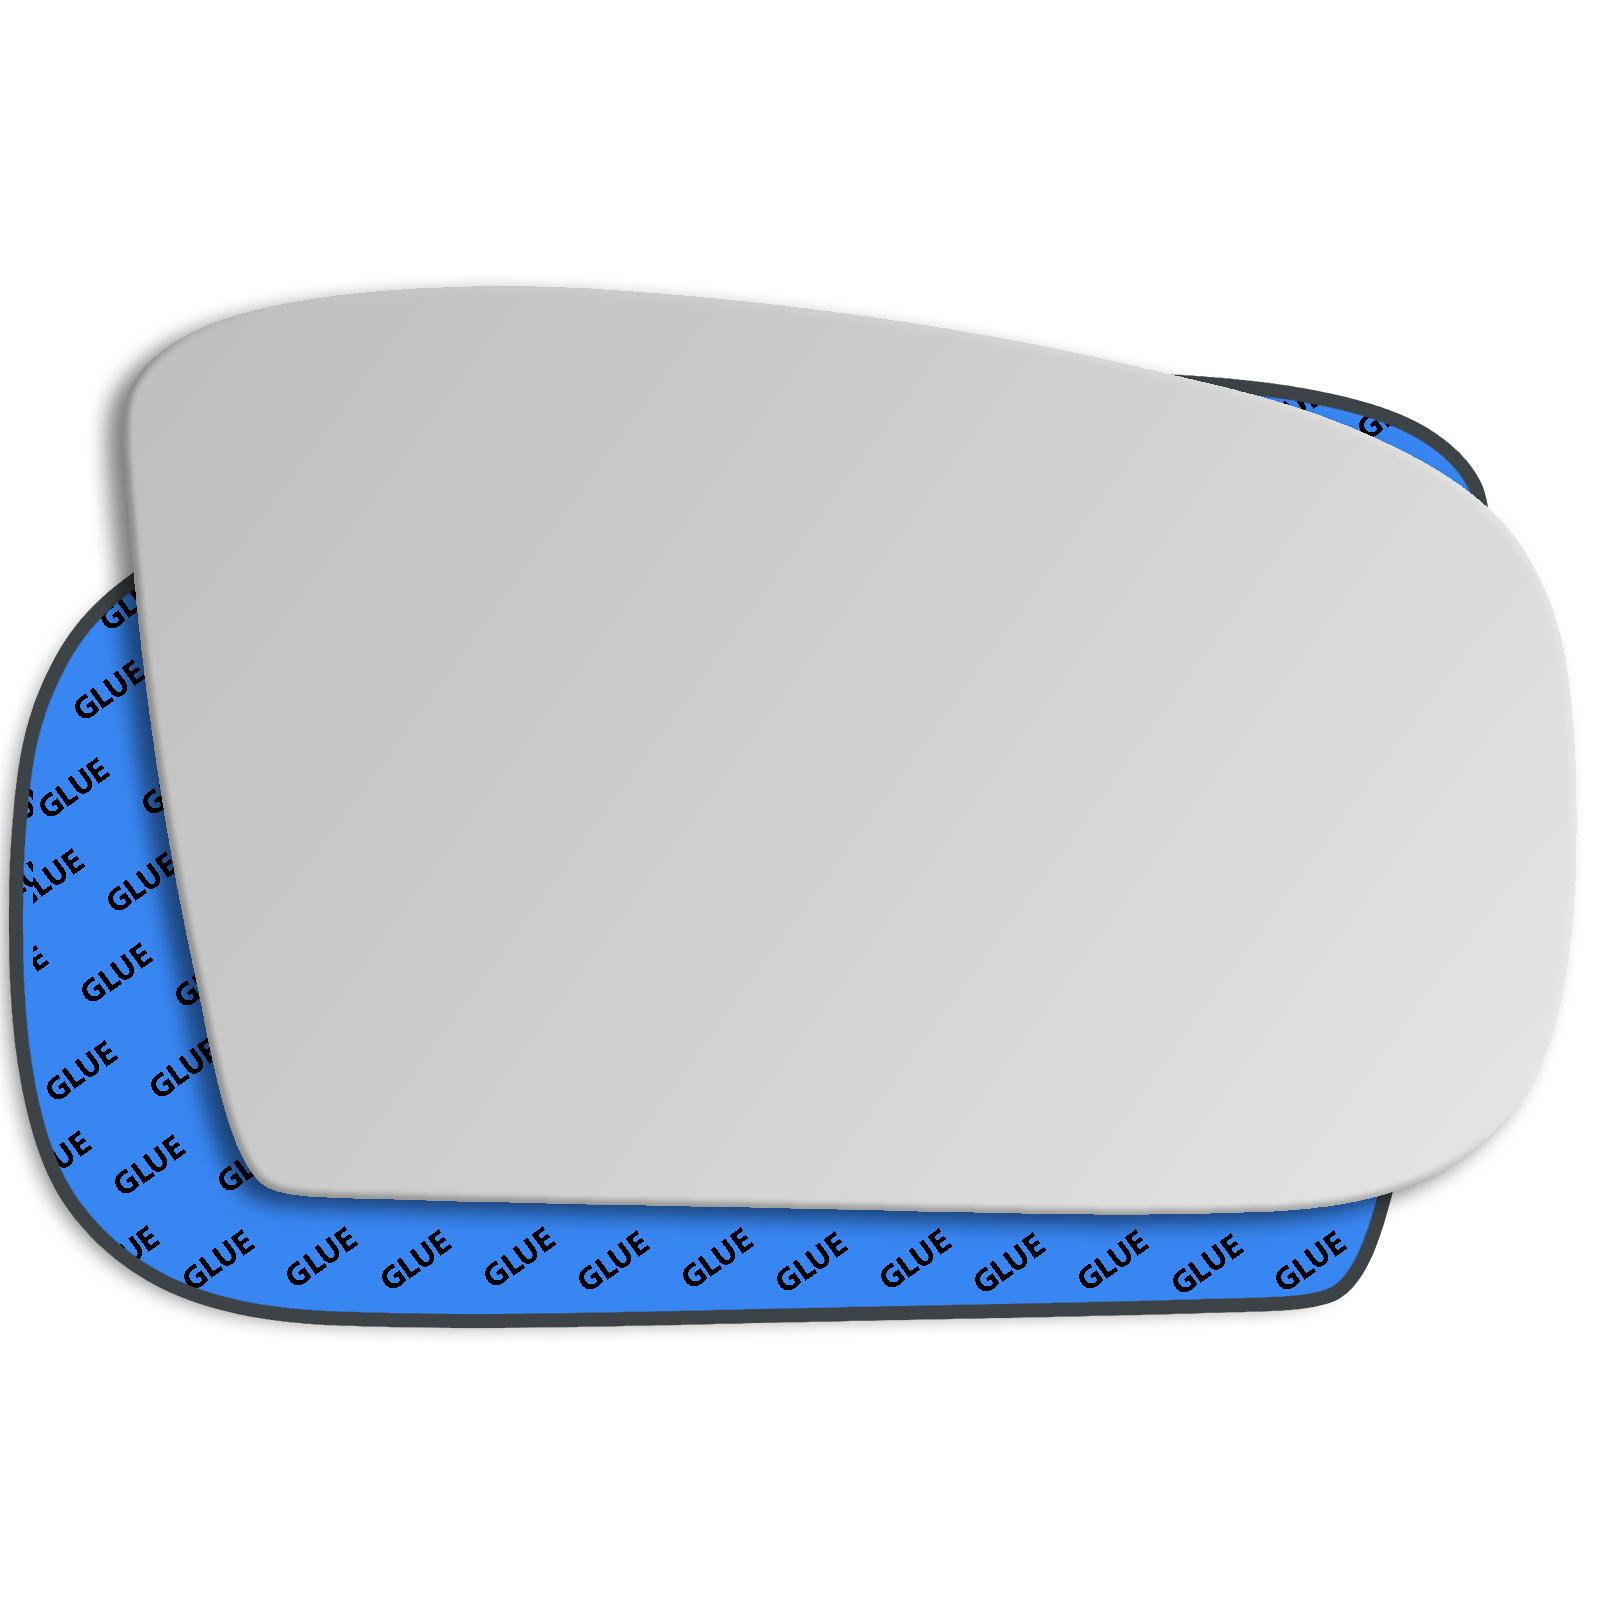 UK Left Passenger Side Blue Mirror Glass for Mercedes C Class W203 2000-2007